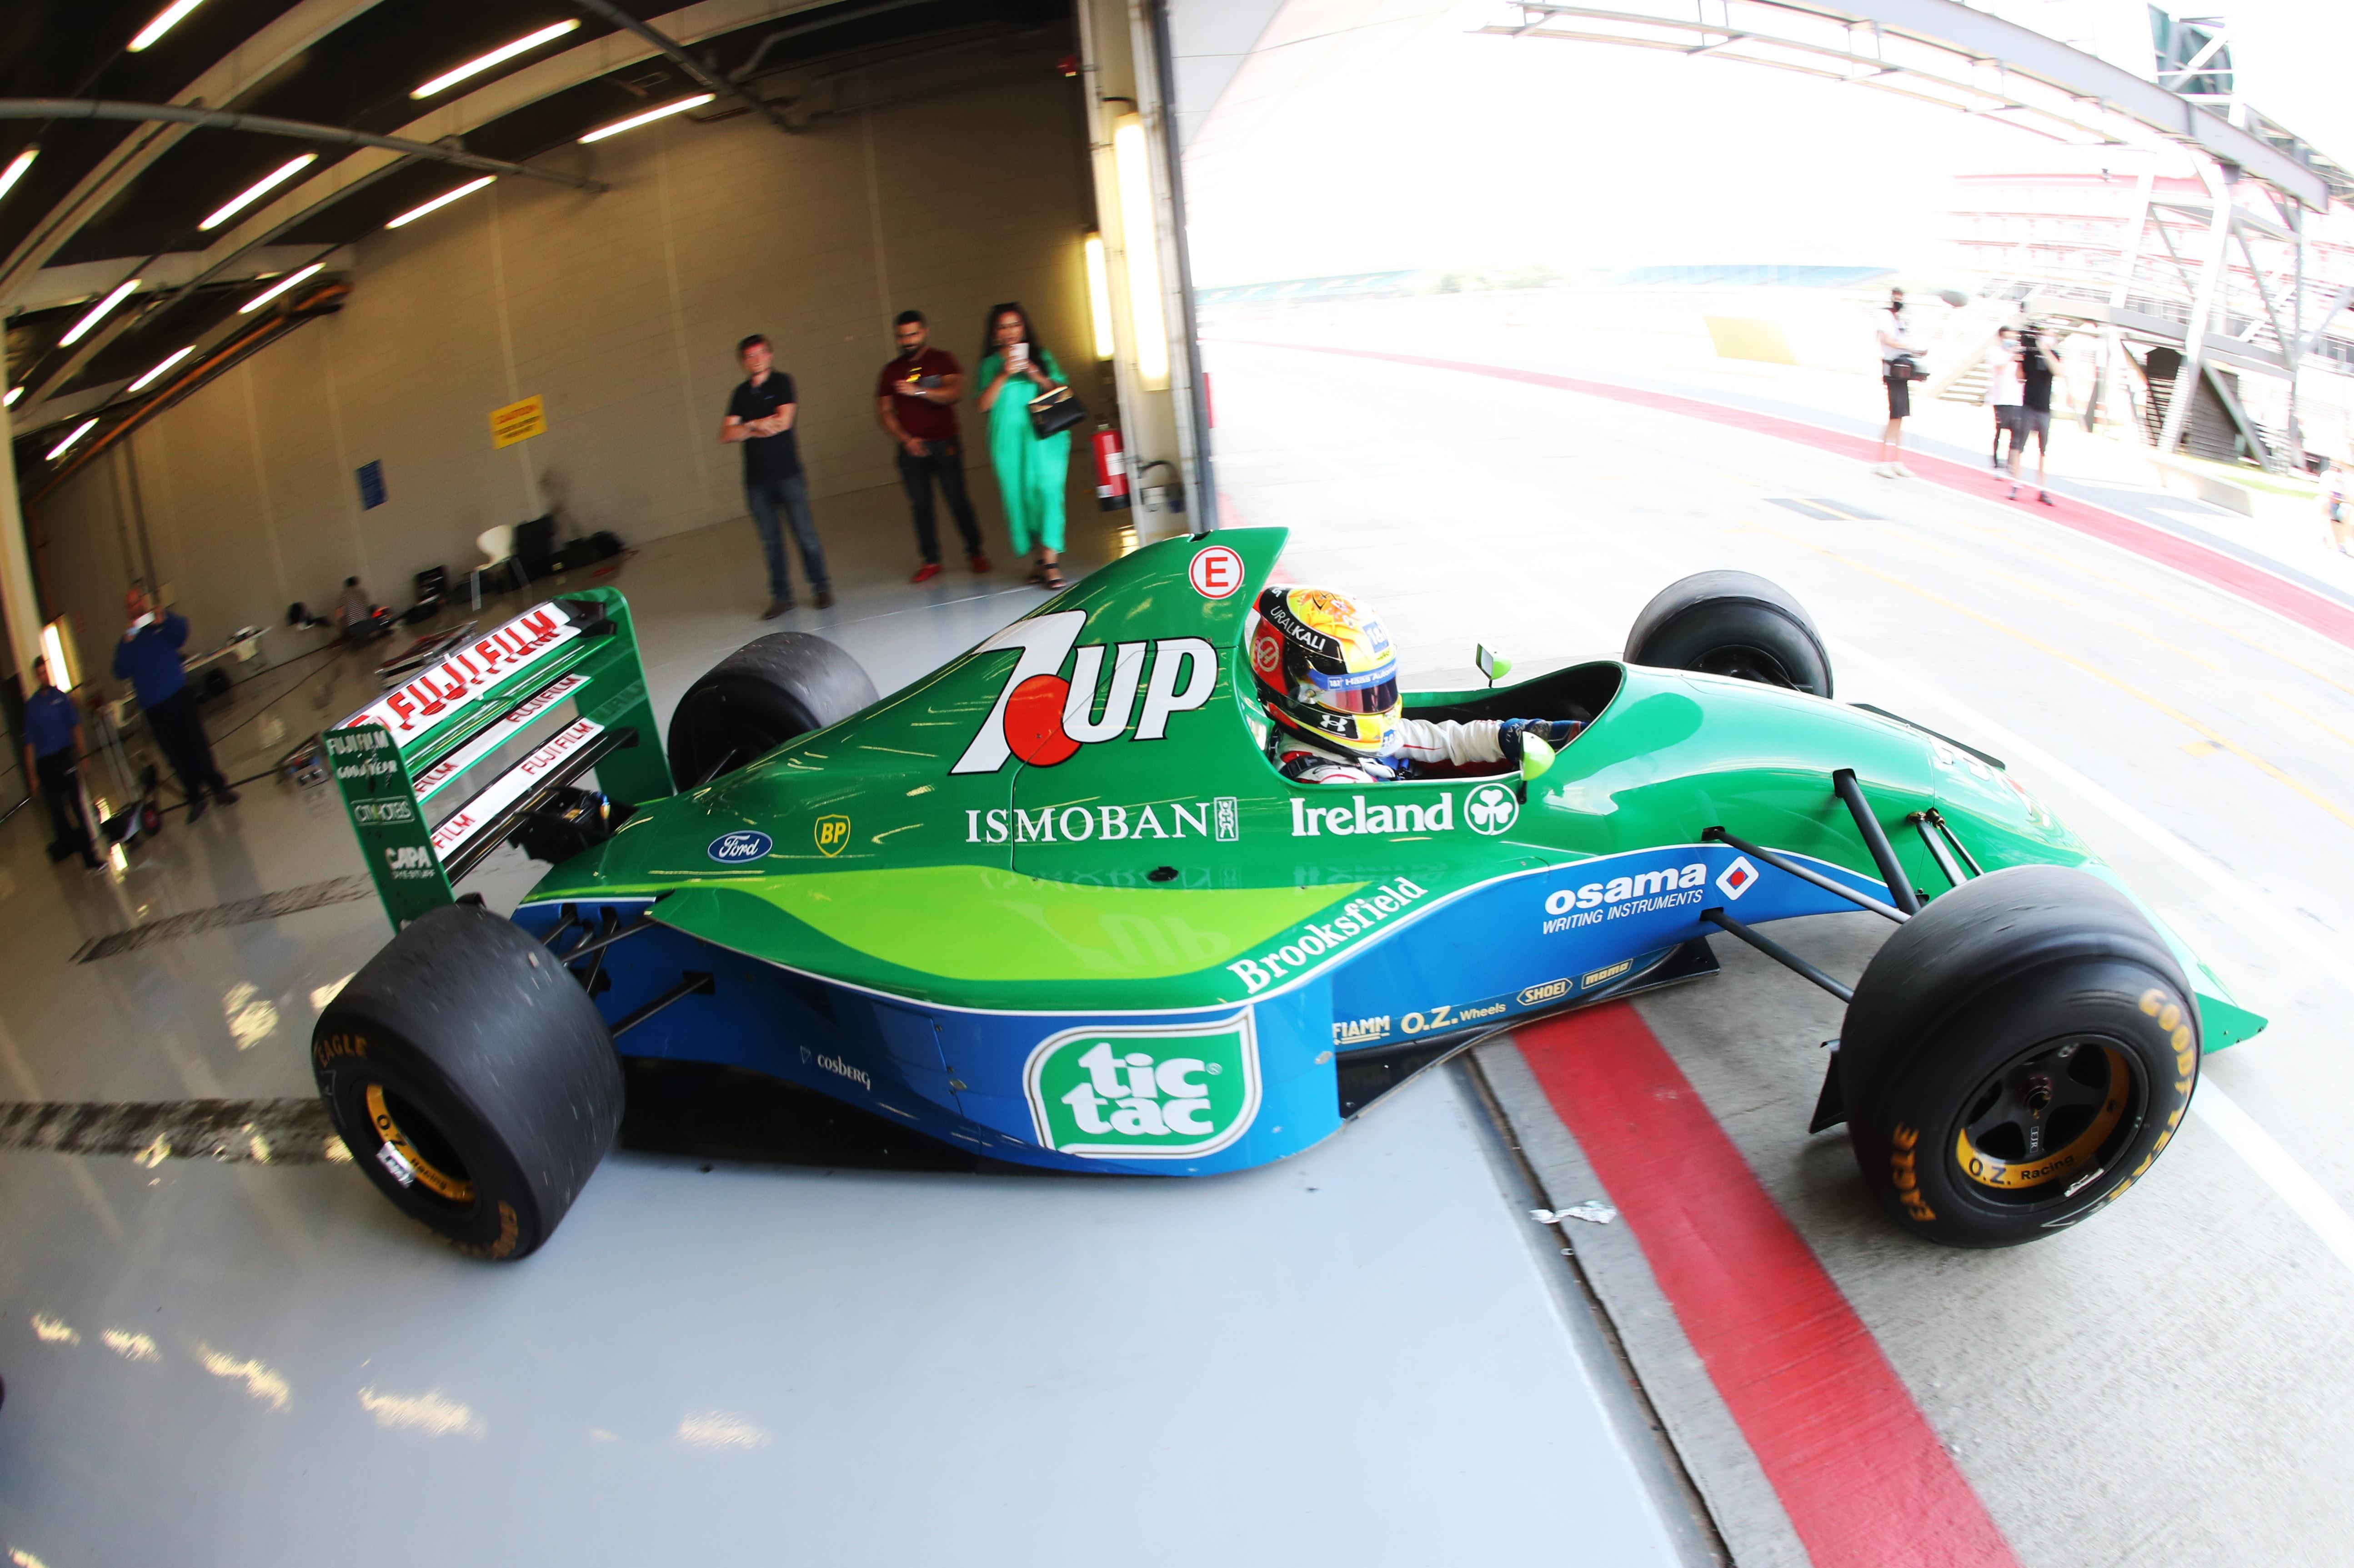 Schumacher had to get his head around the H-pattern gearbox on the 191